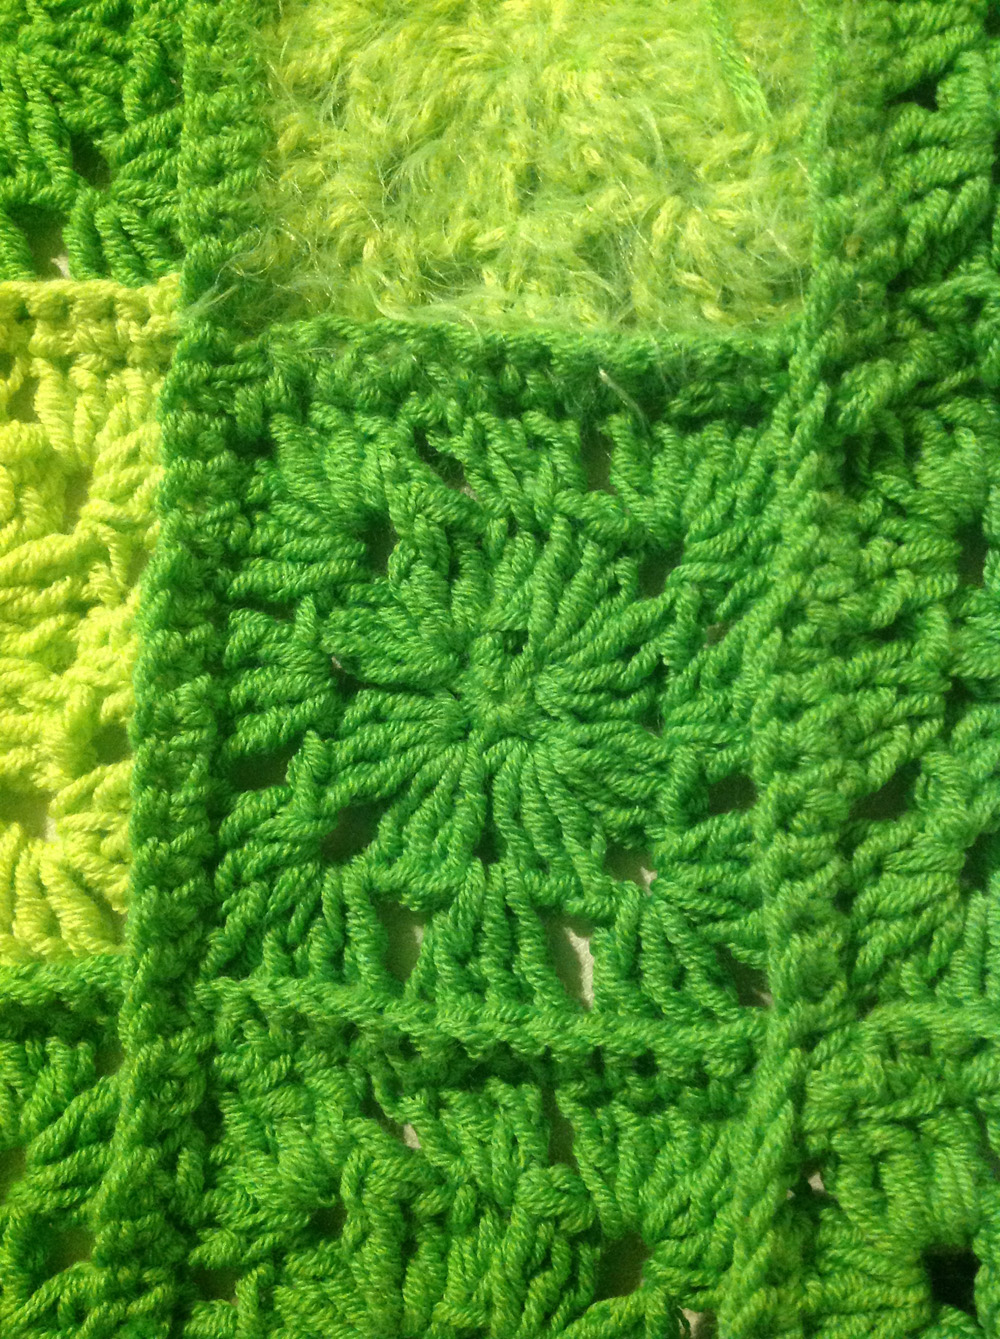 Granny Square Detail aus:  Lana Grossa Elastico und Lana Grossa Estivo